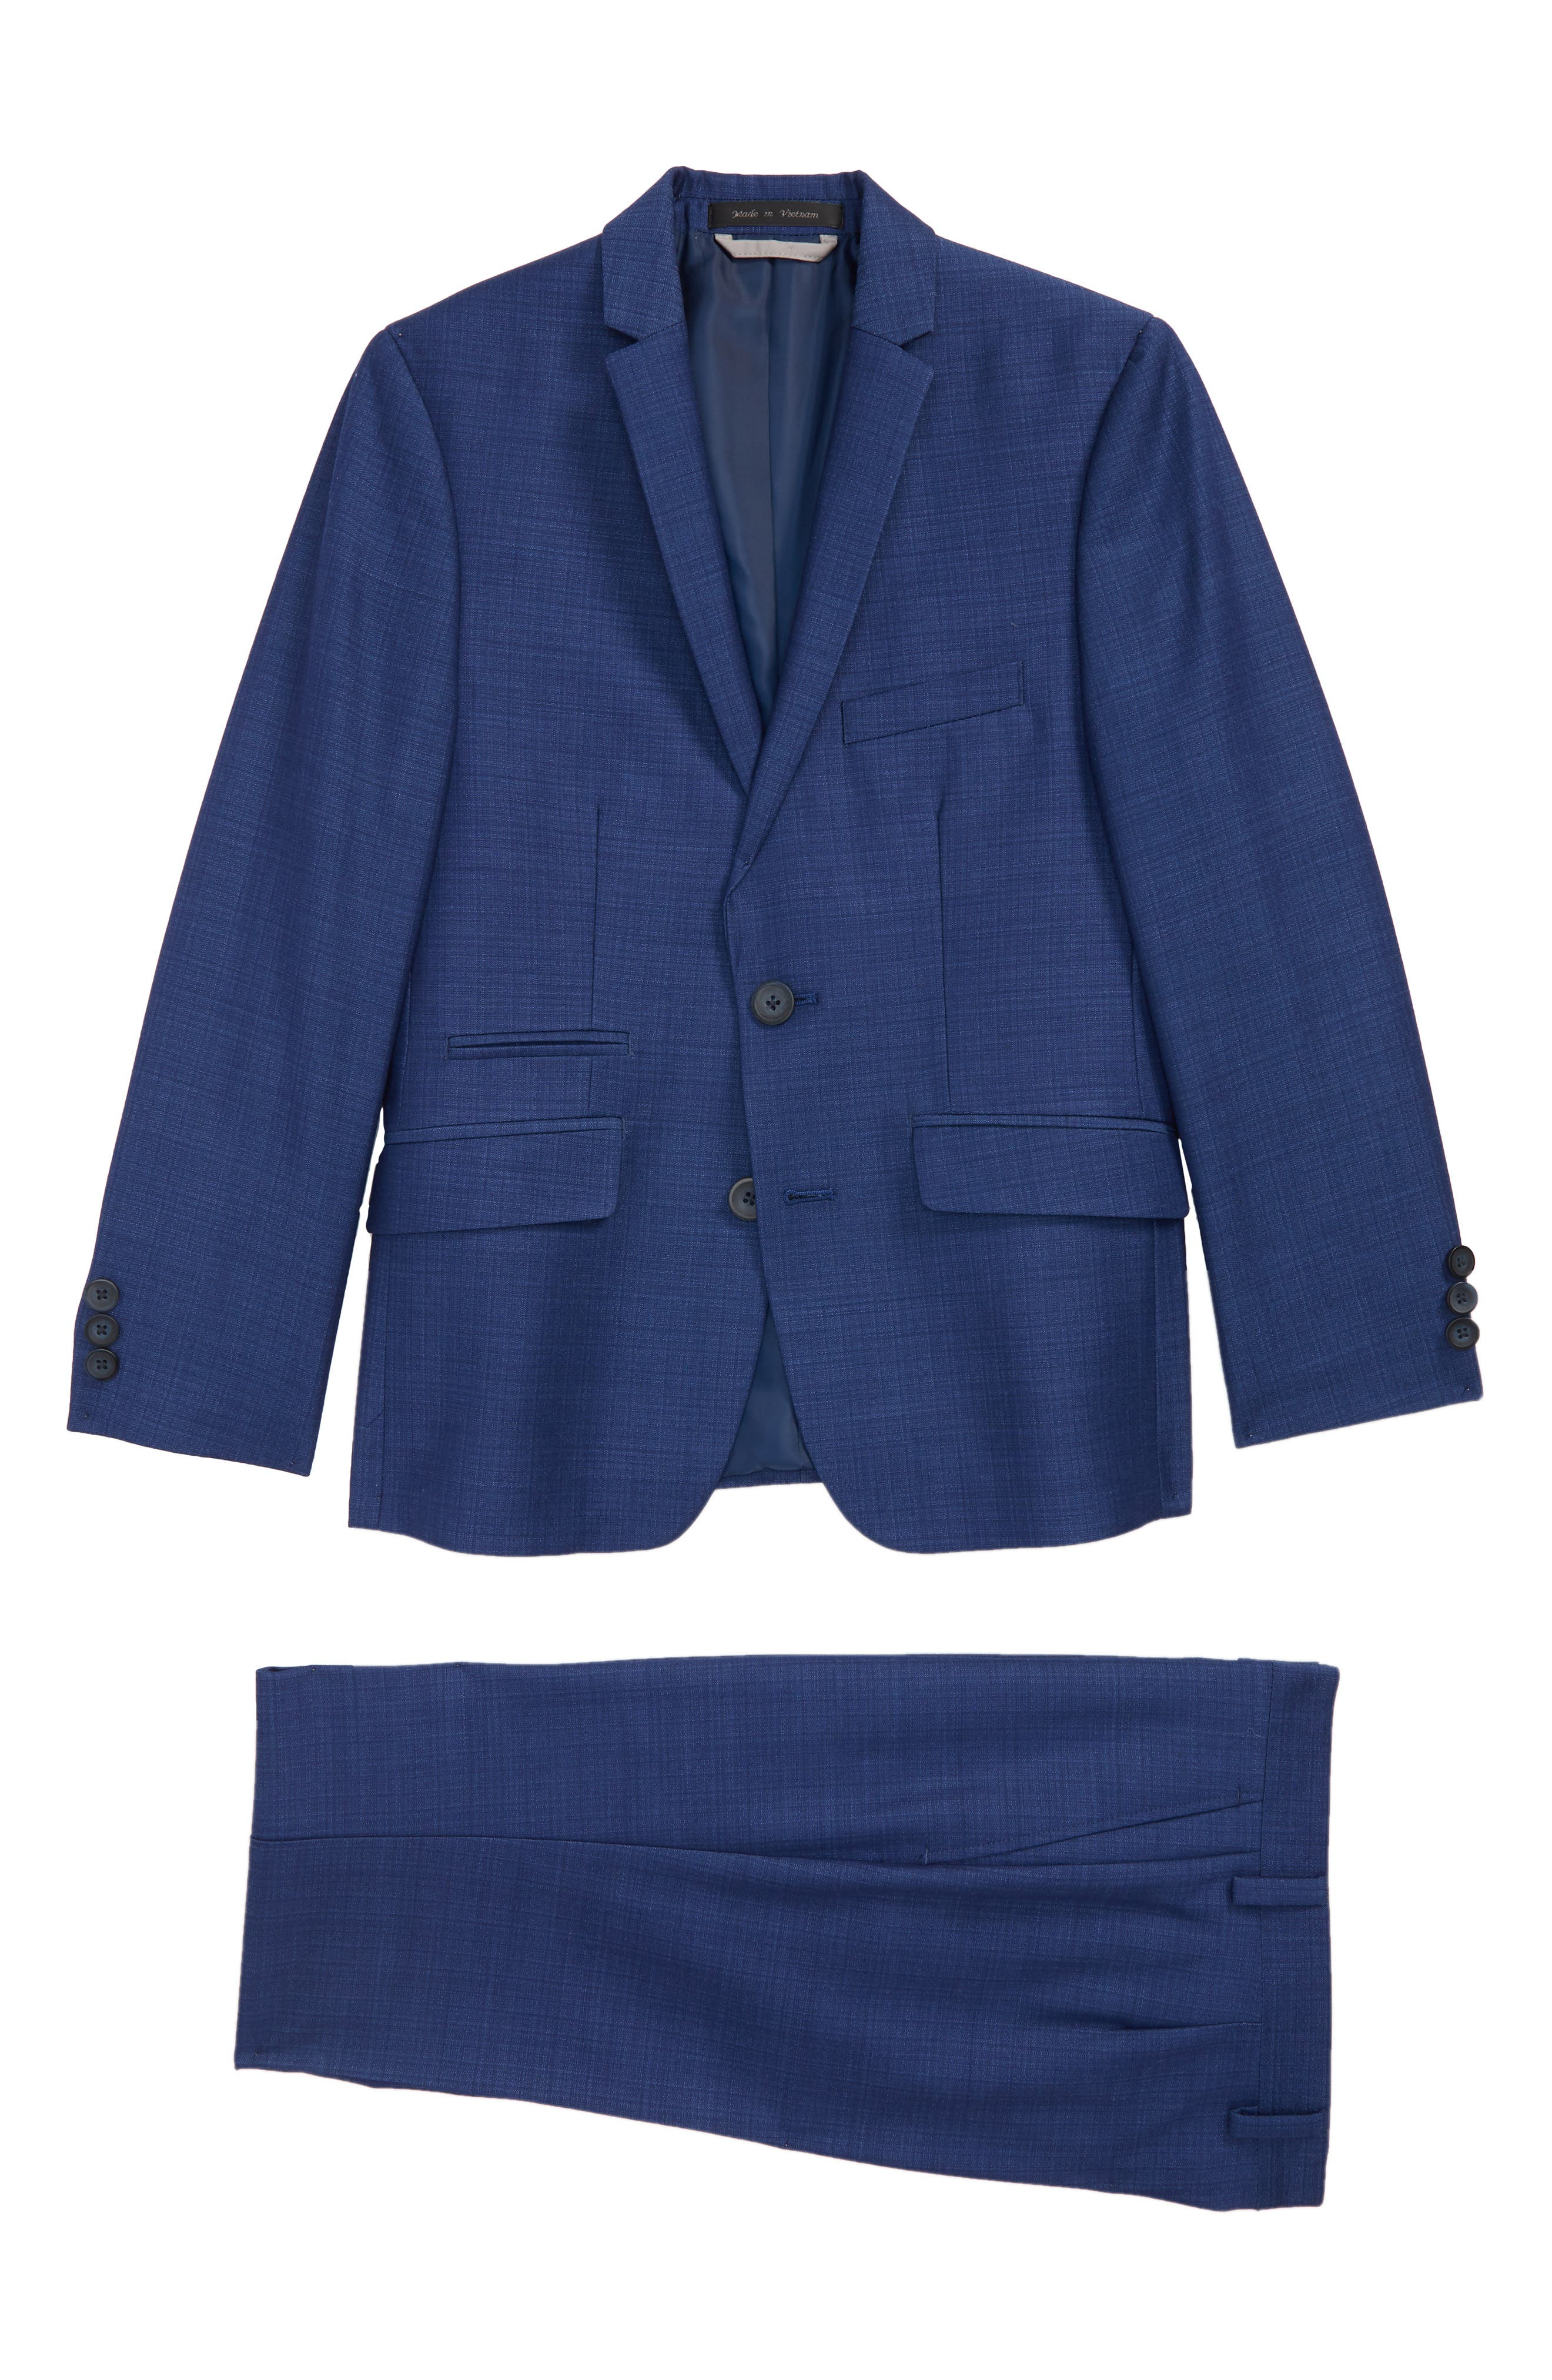 Textured Suit,                         Main,                         color, 420